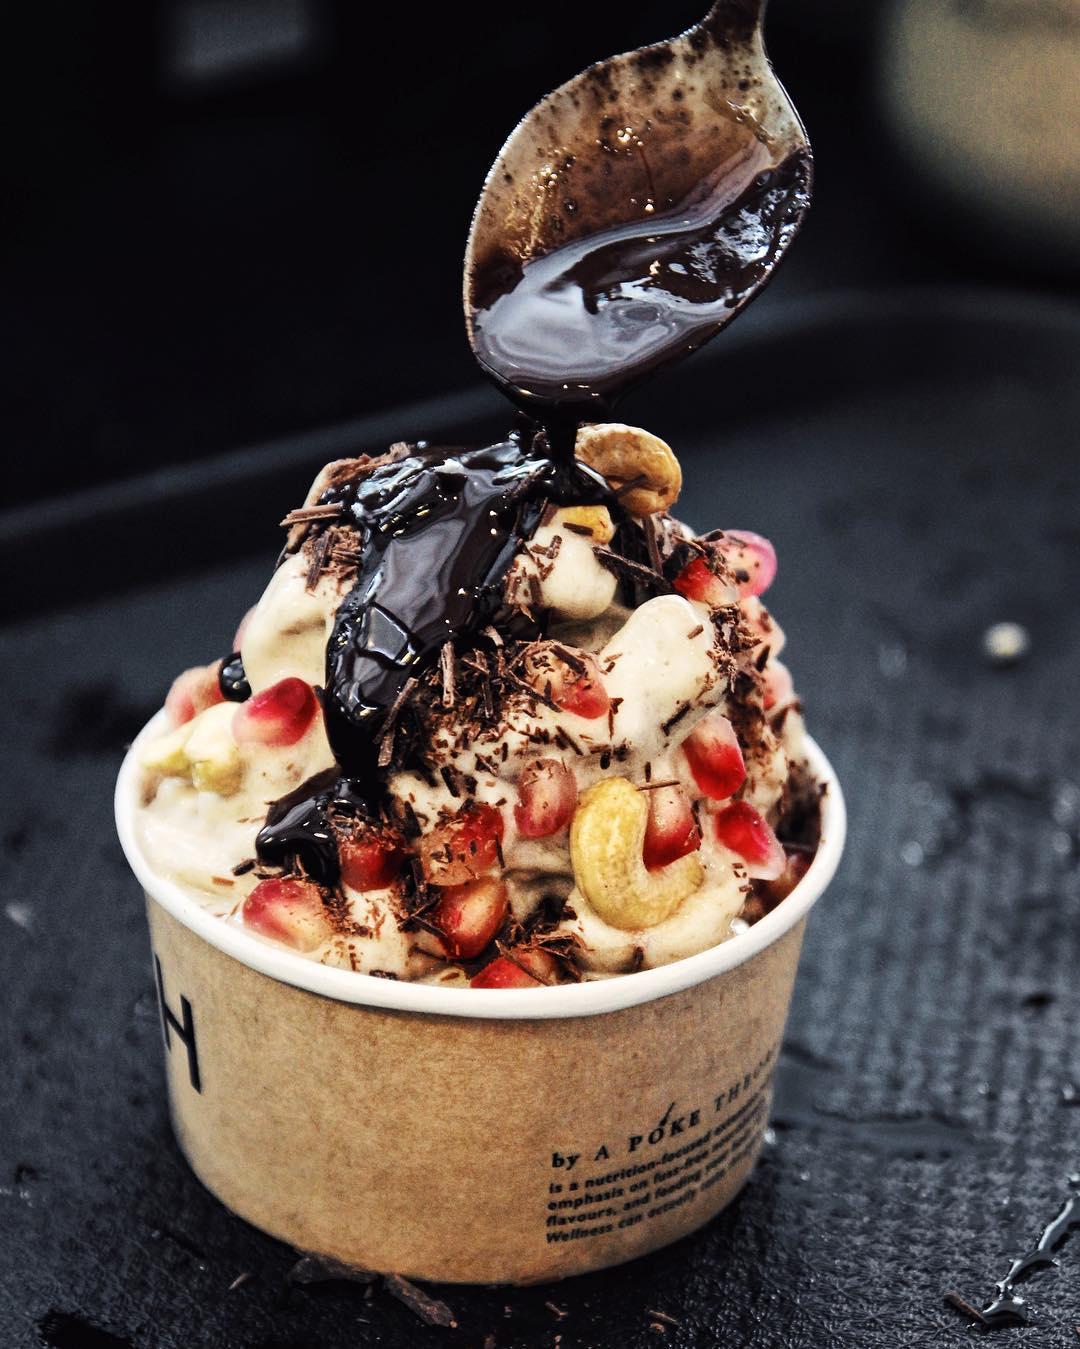 Food-Menu-A-Poke-Theory-Lunch-Deals-Guide-Singapore-2017-2018-Venuerific